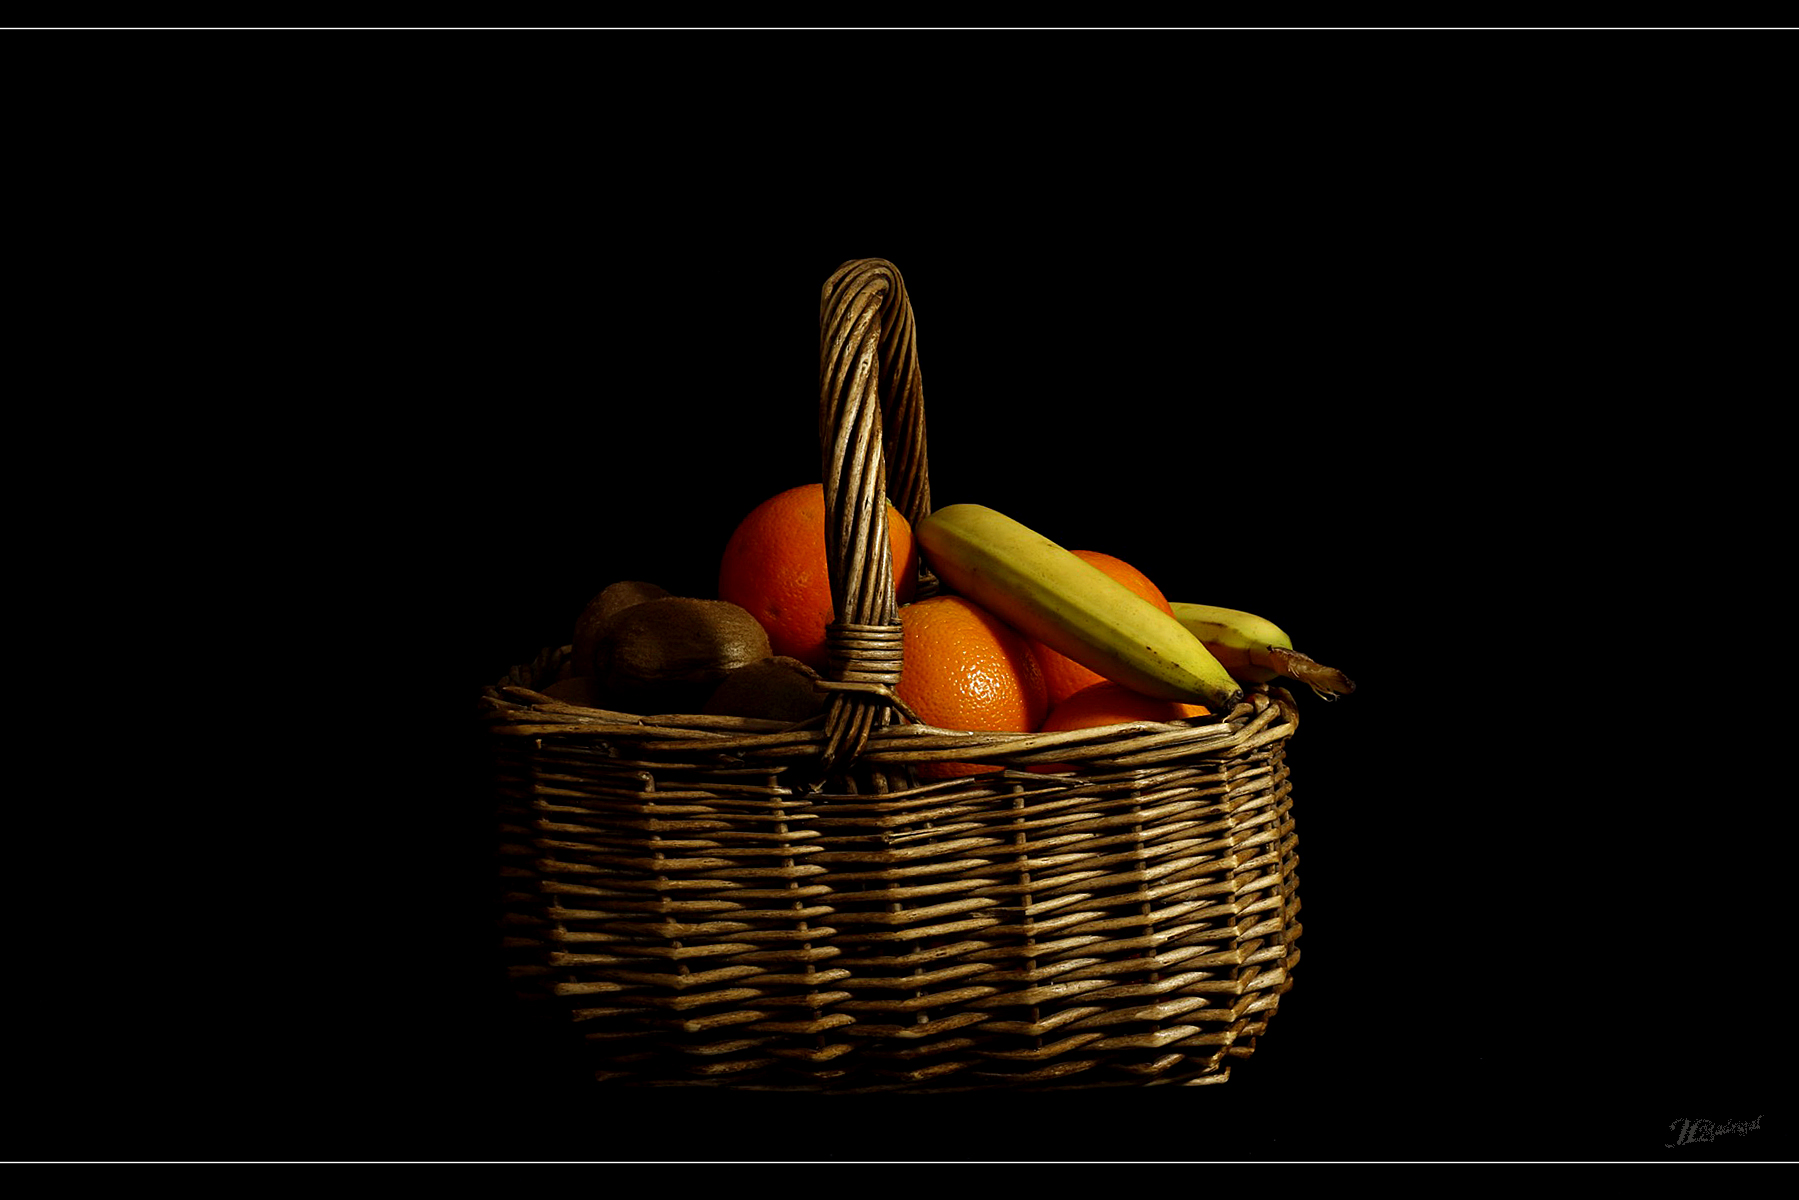 http://kintafoto.es/wp-content/uploads/2017/01/cesta-de-fruta.jpg